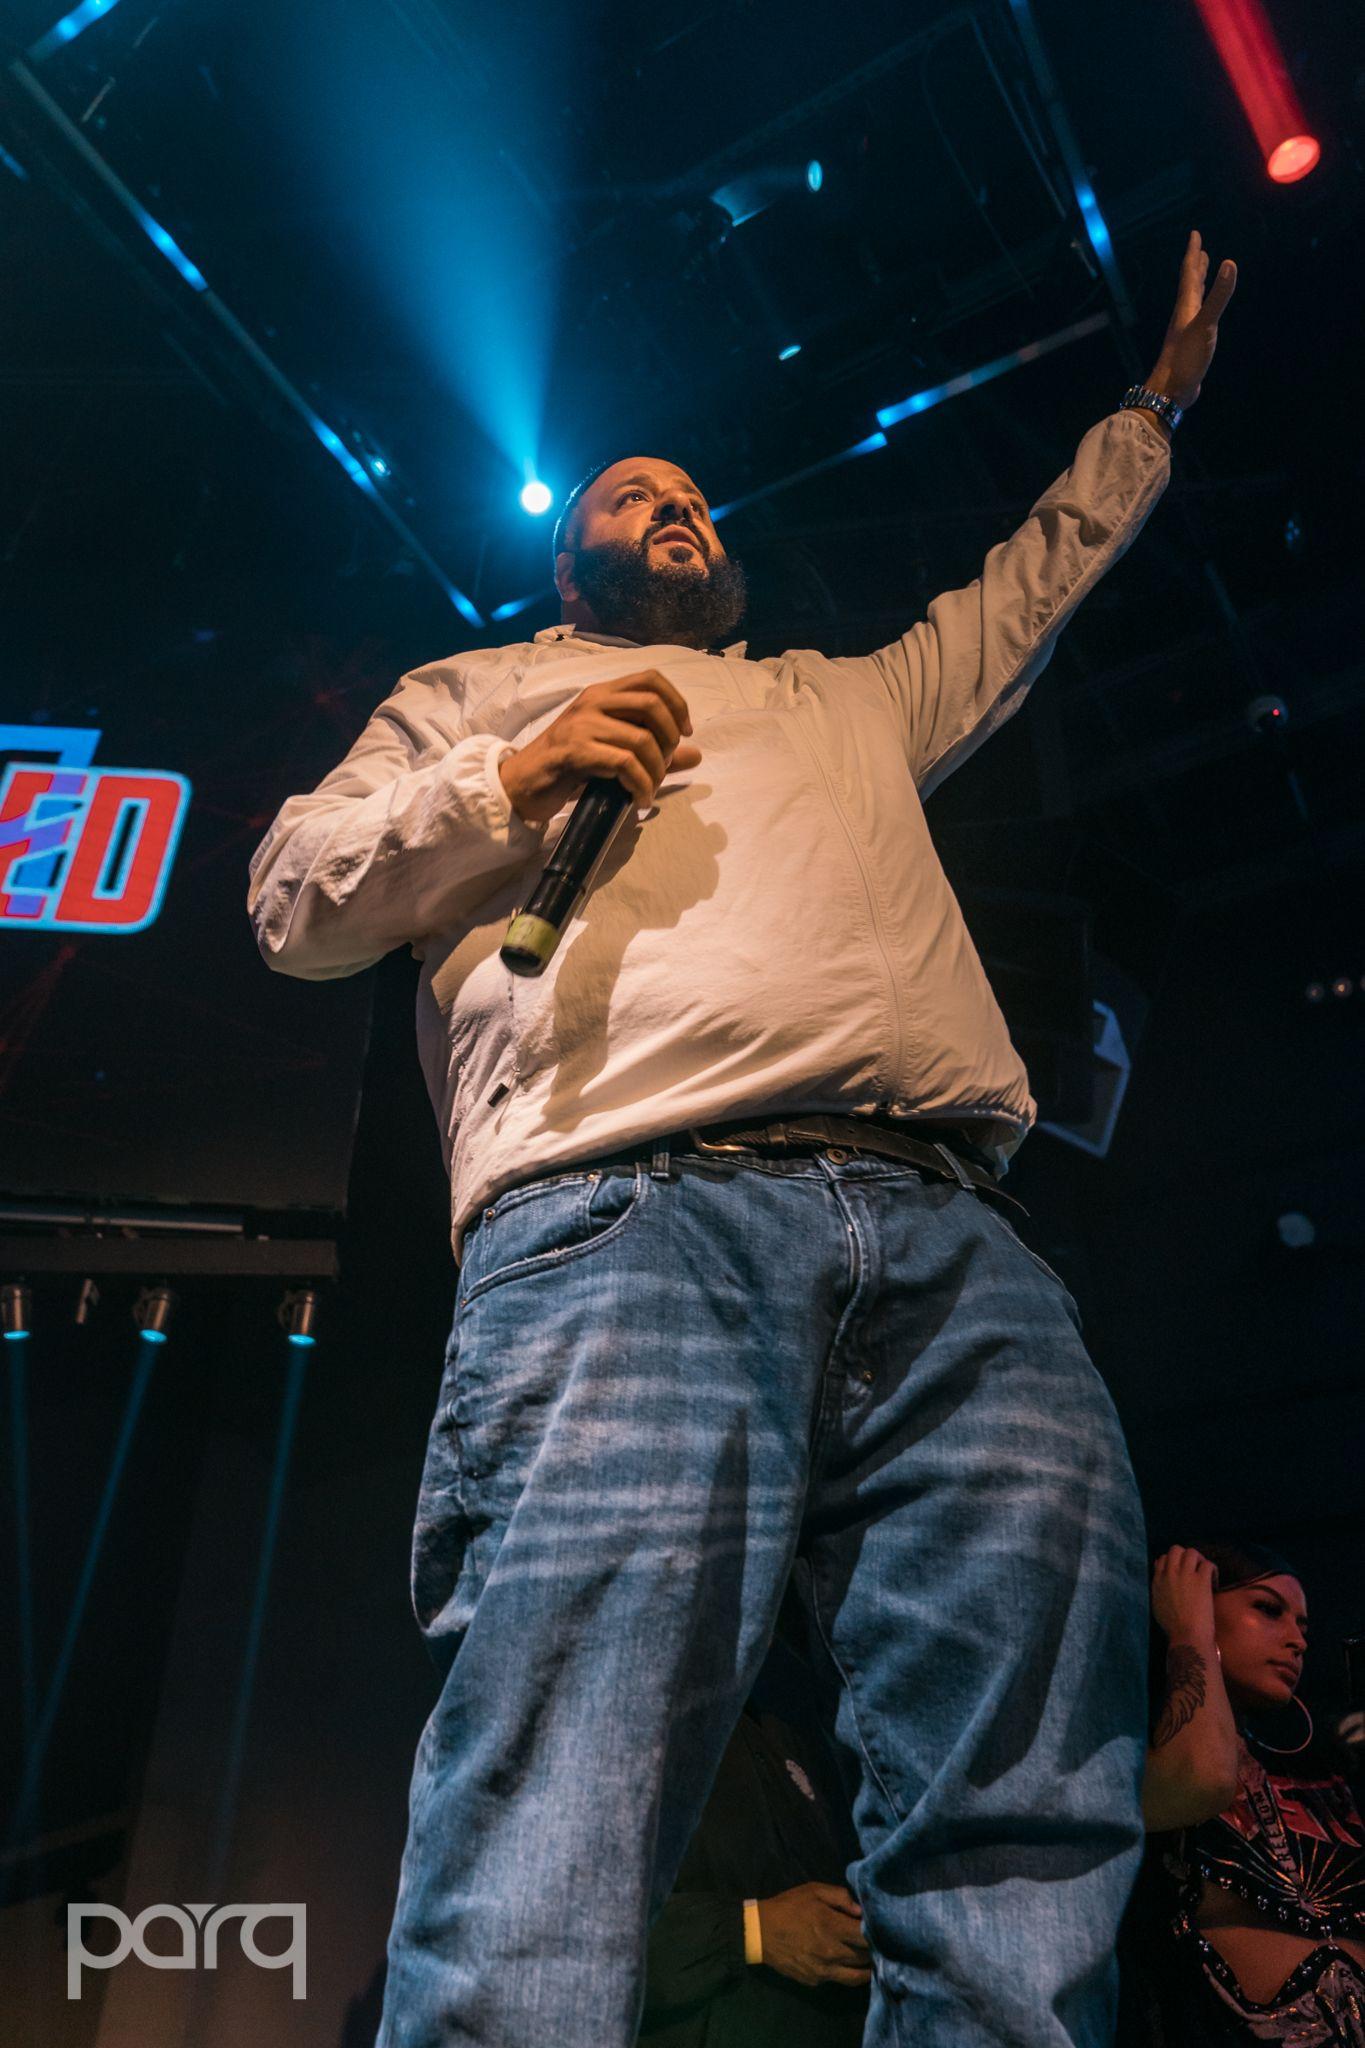 09.27.18 Parq - DJ Khaled-31.jpg